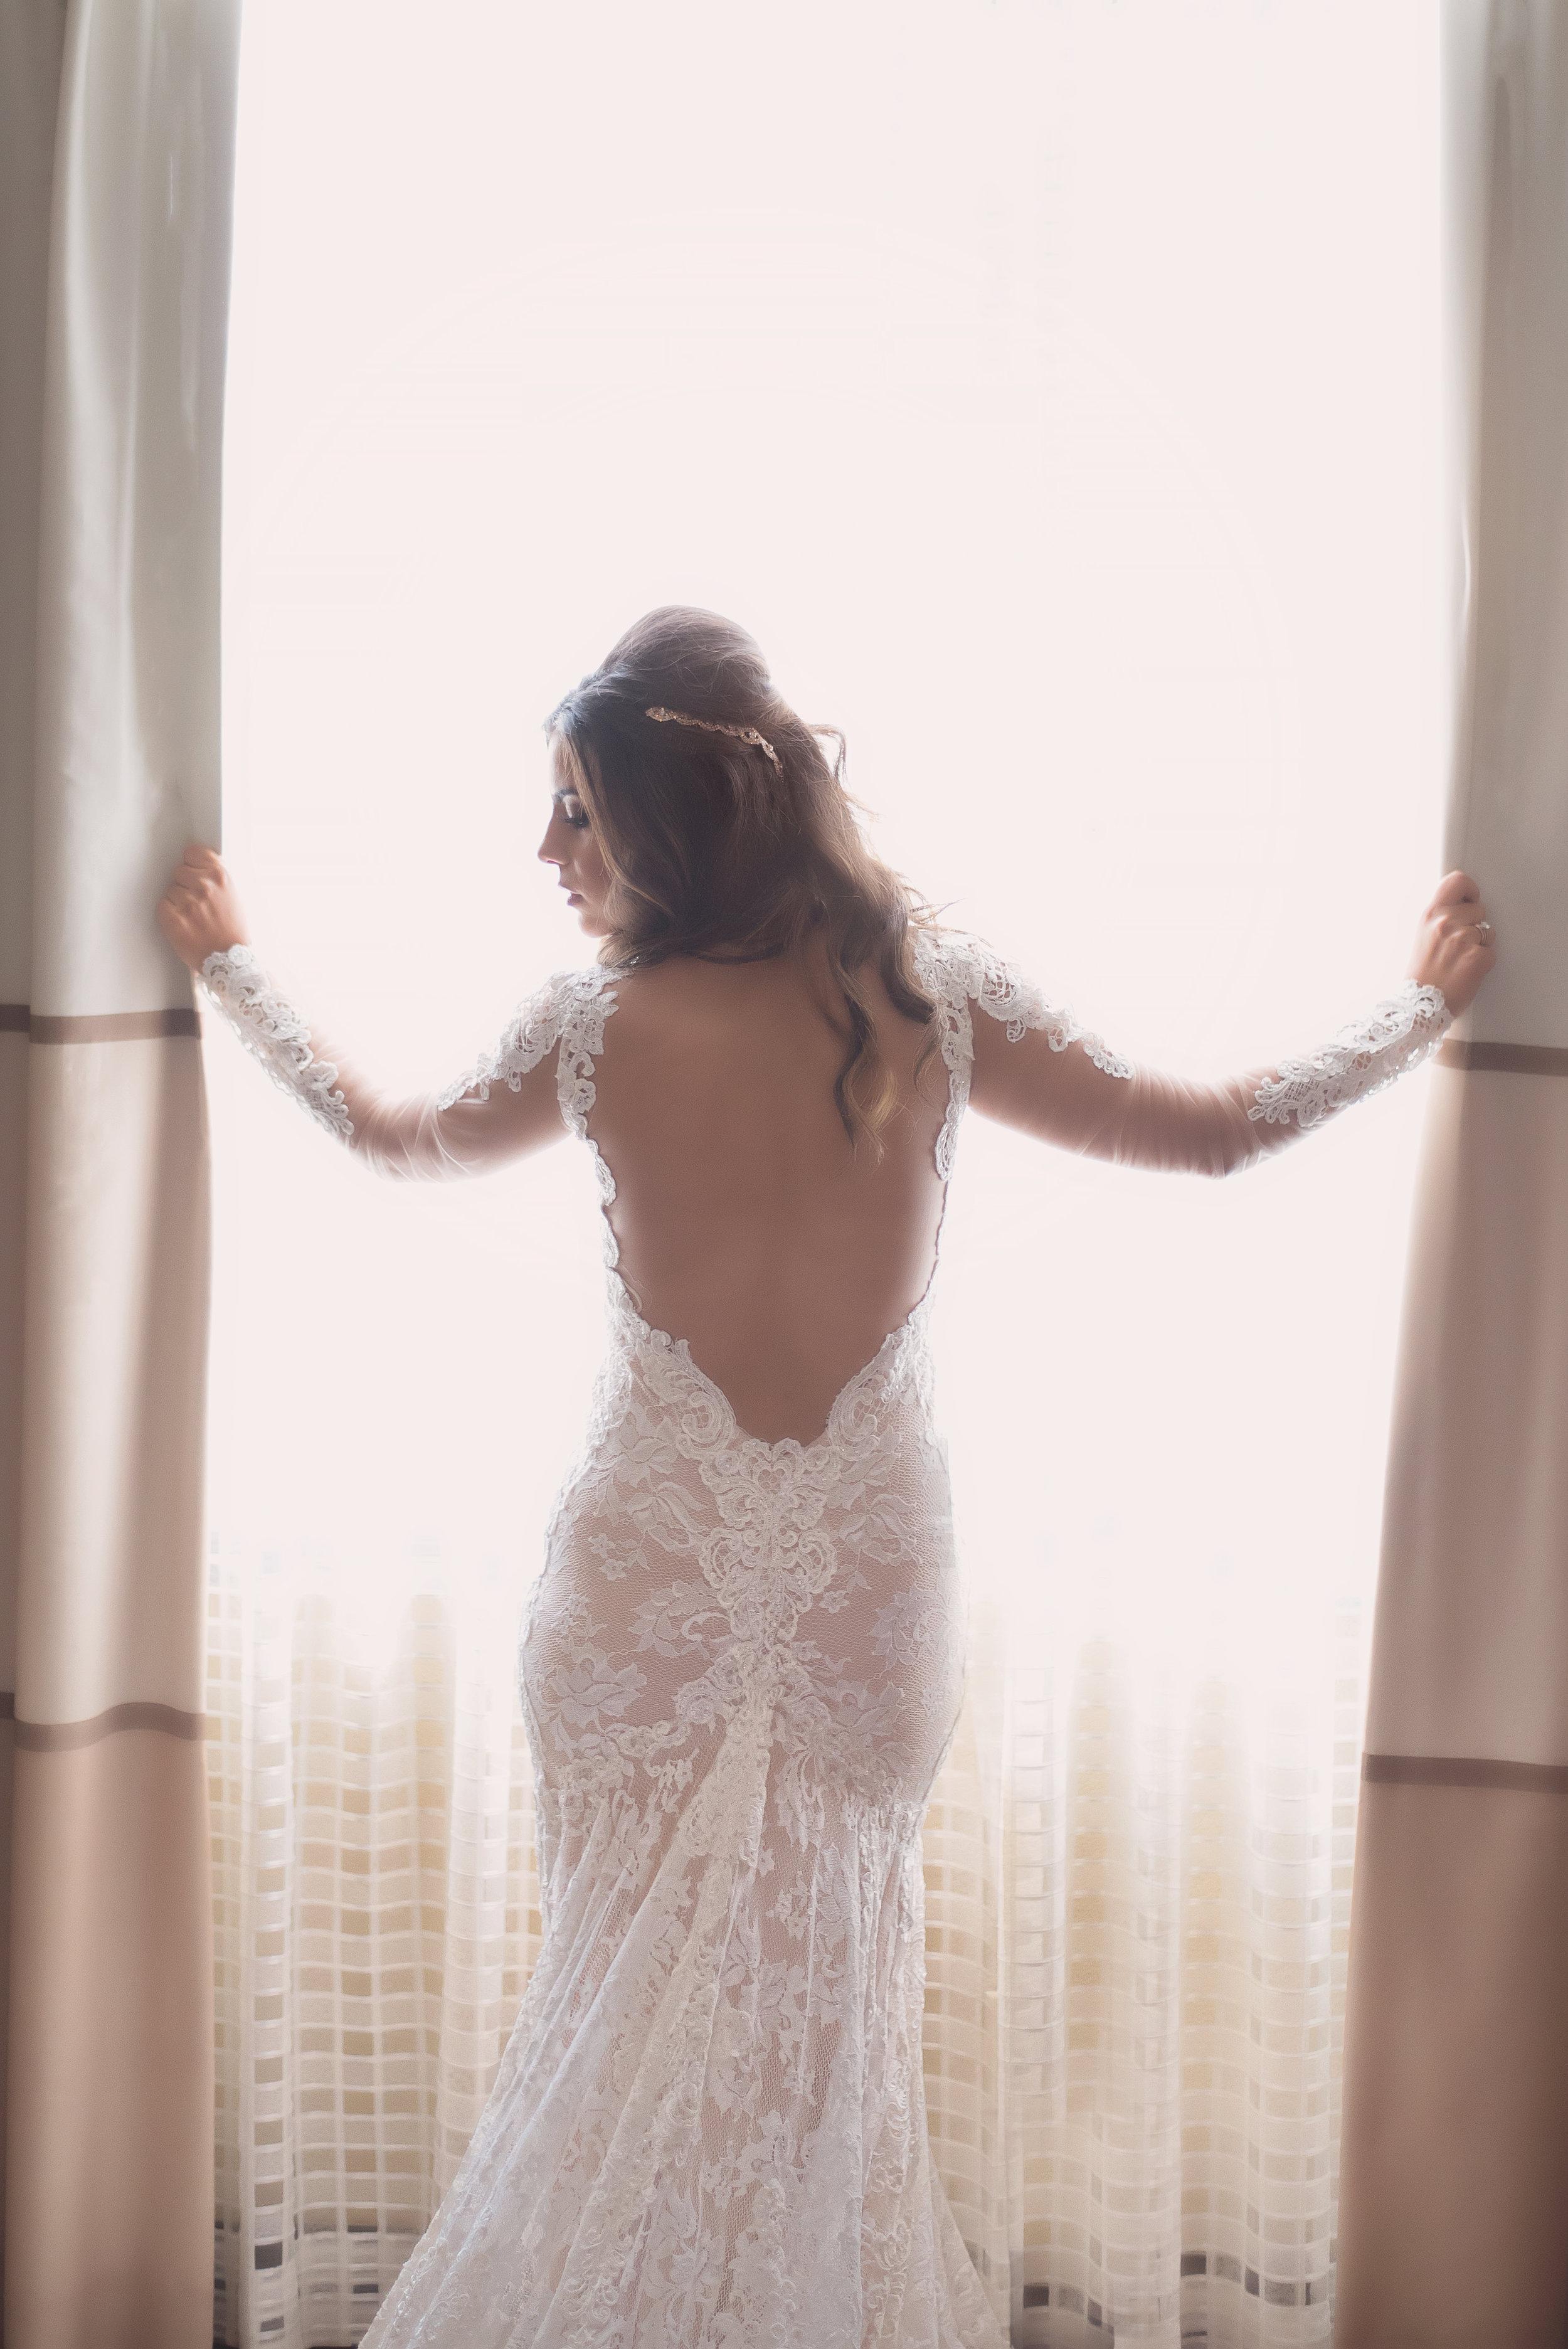 International wedding photographer anthony mickeal 85752